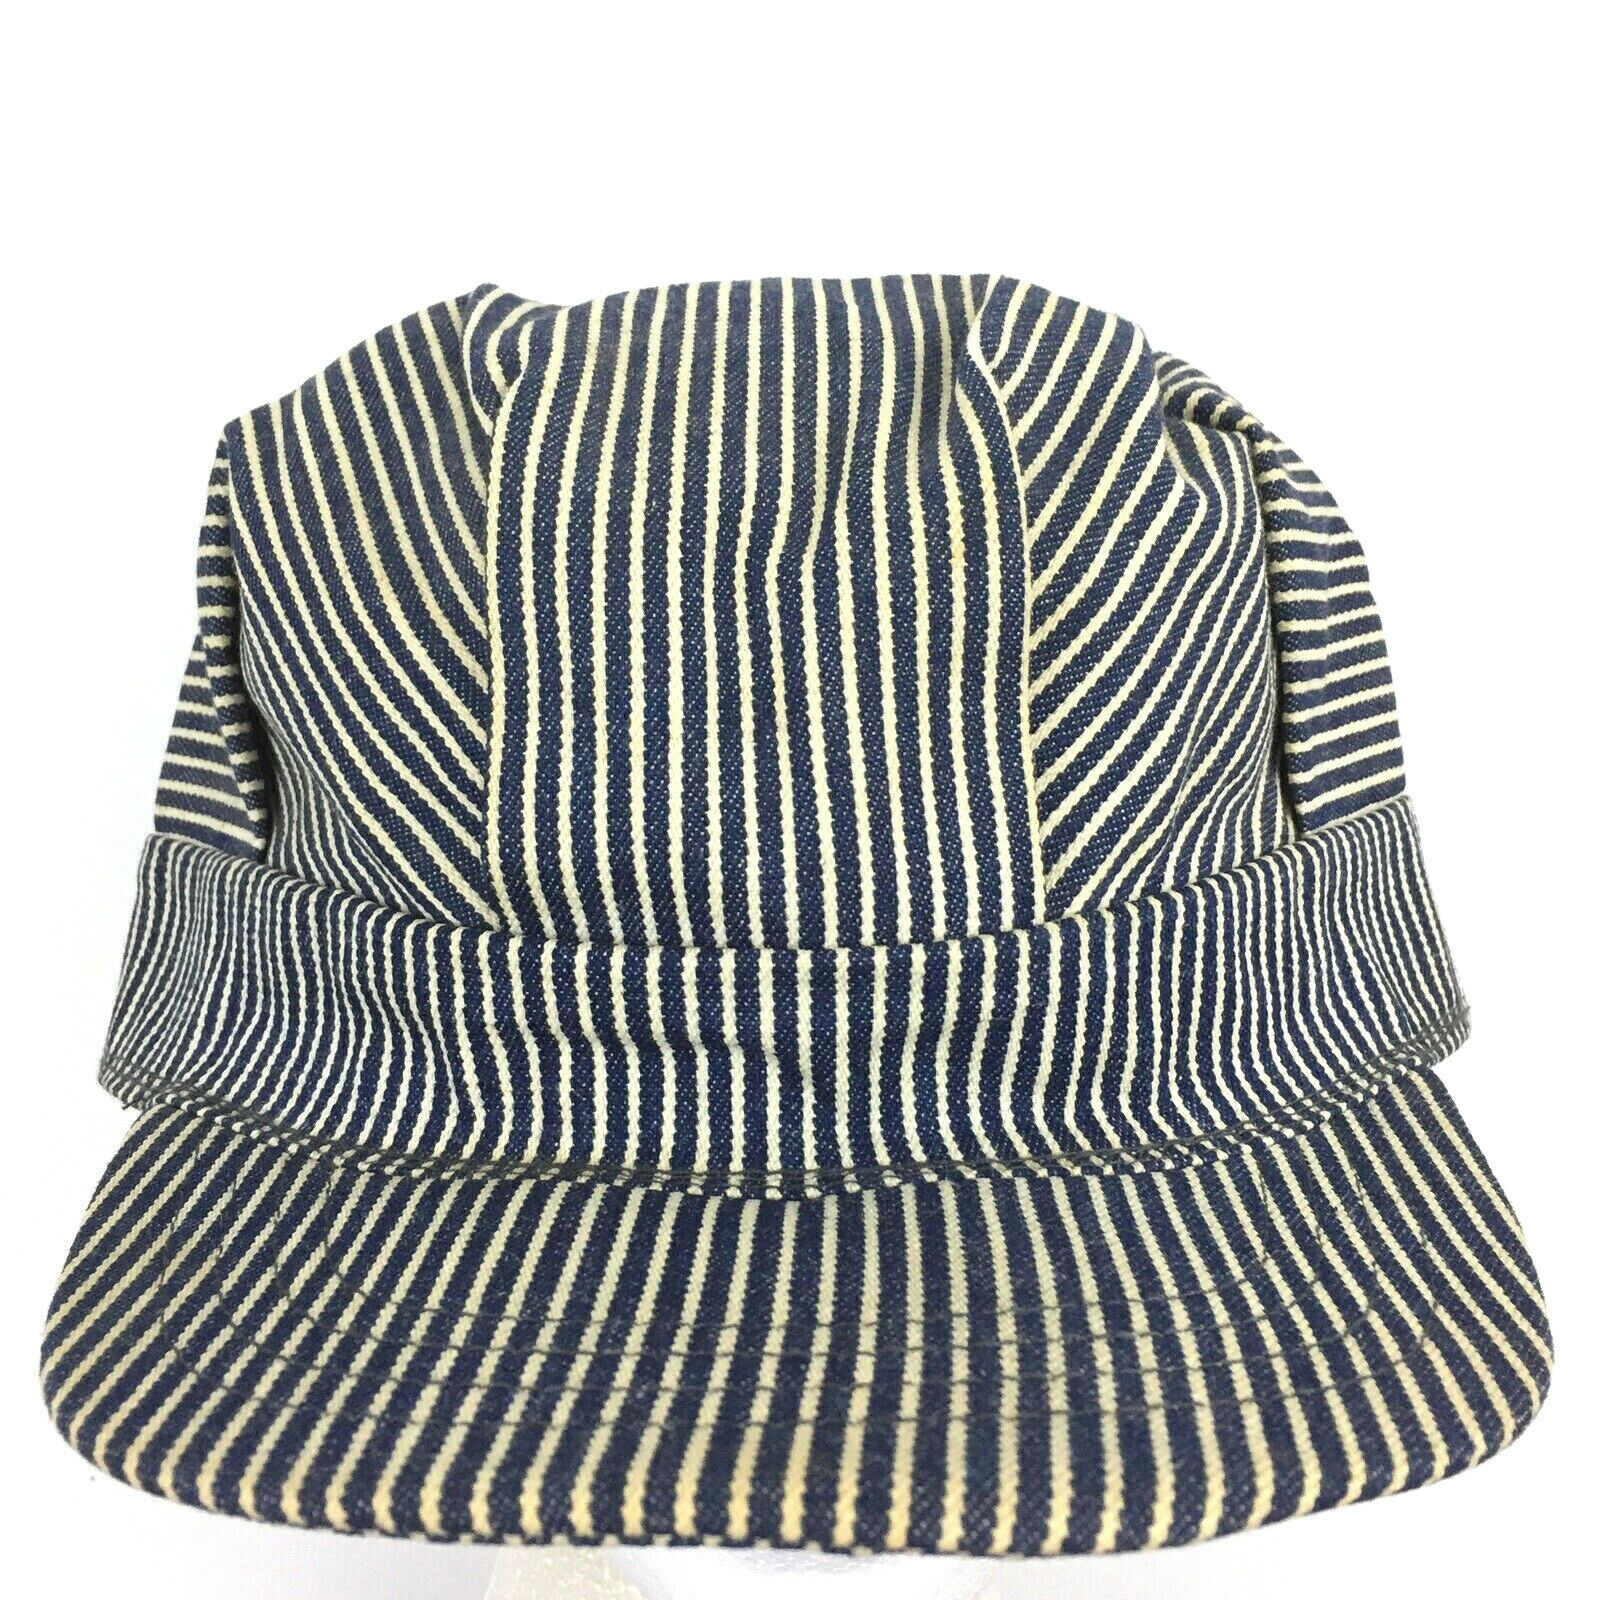 Vtg 80s Train Railroad Engineer Cap Made USA Snap Back Pin Striped Baseball Hat